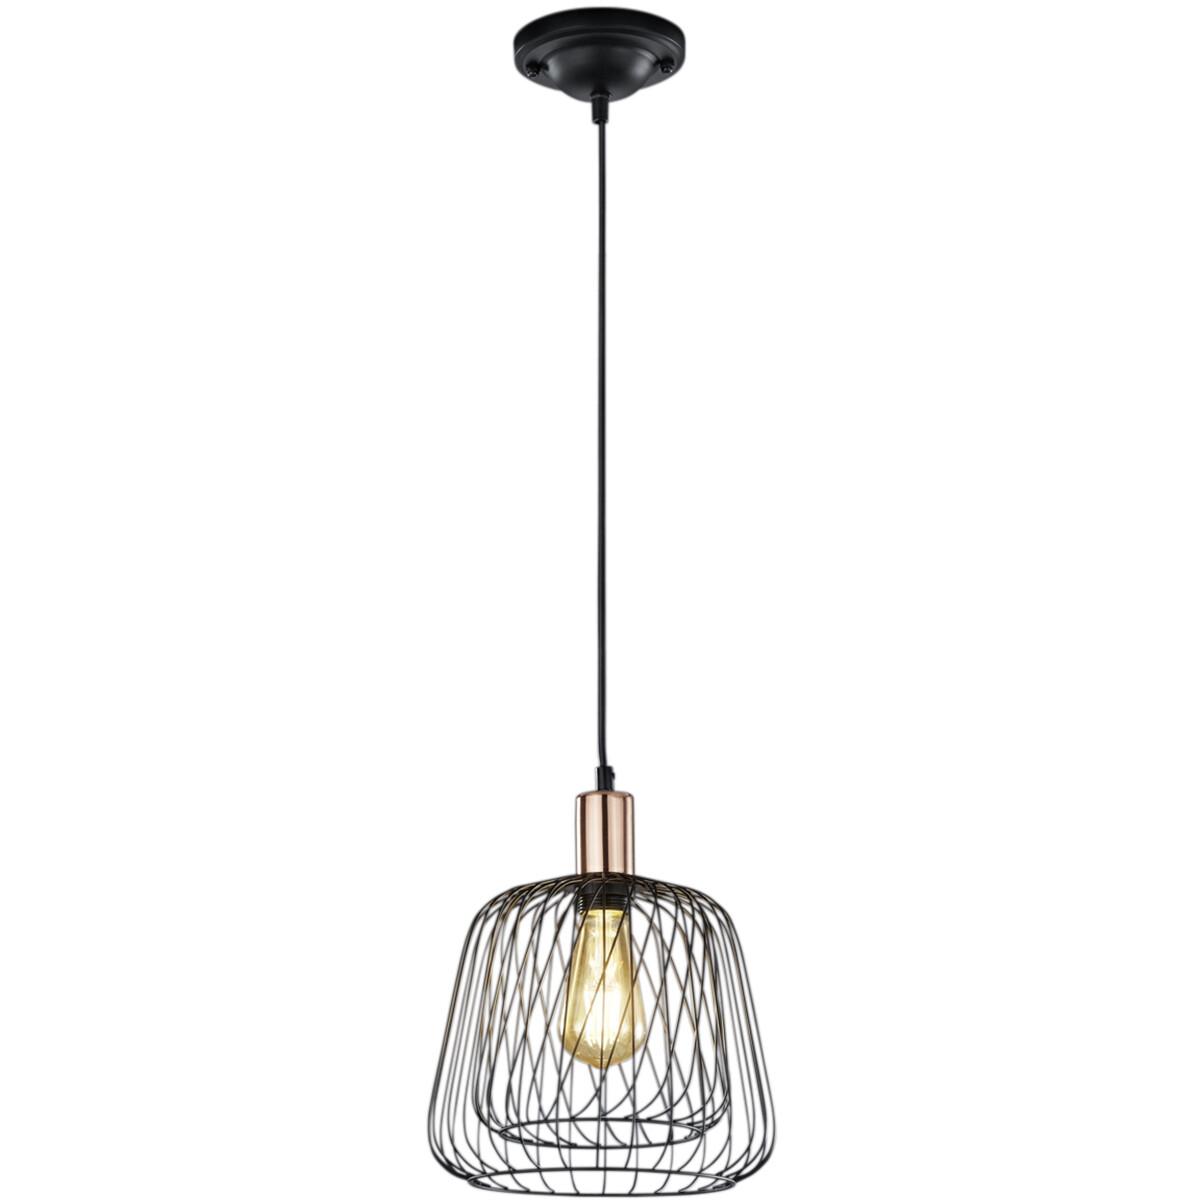 LED Hanglamp - Hangverlichting - Trion Simon - E27 Fitting - 1-lichts - Rond - Mat Zwart - Aluminium